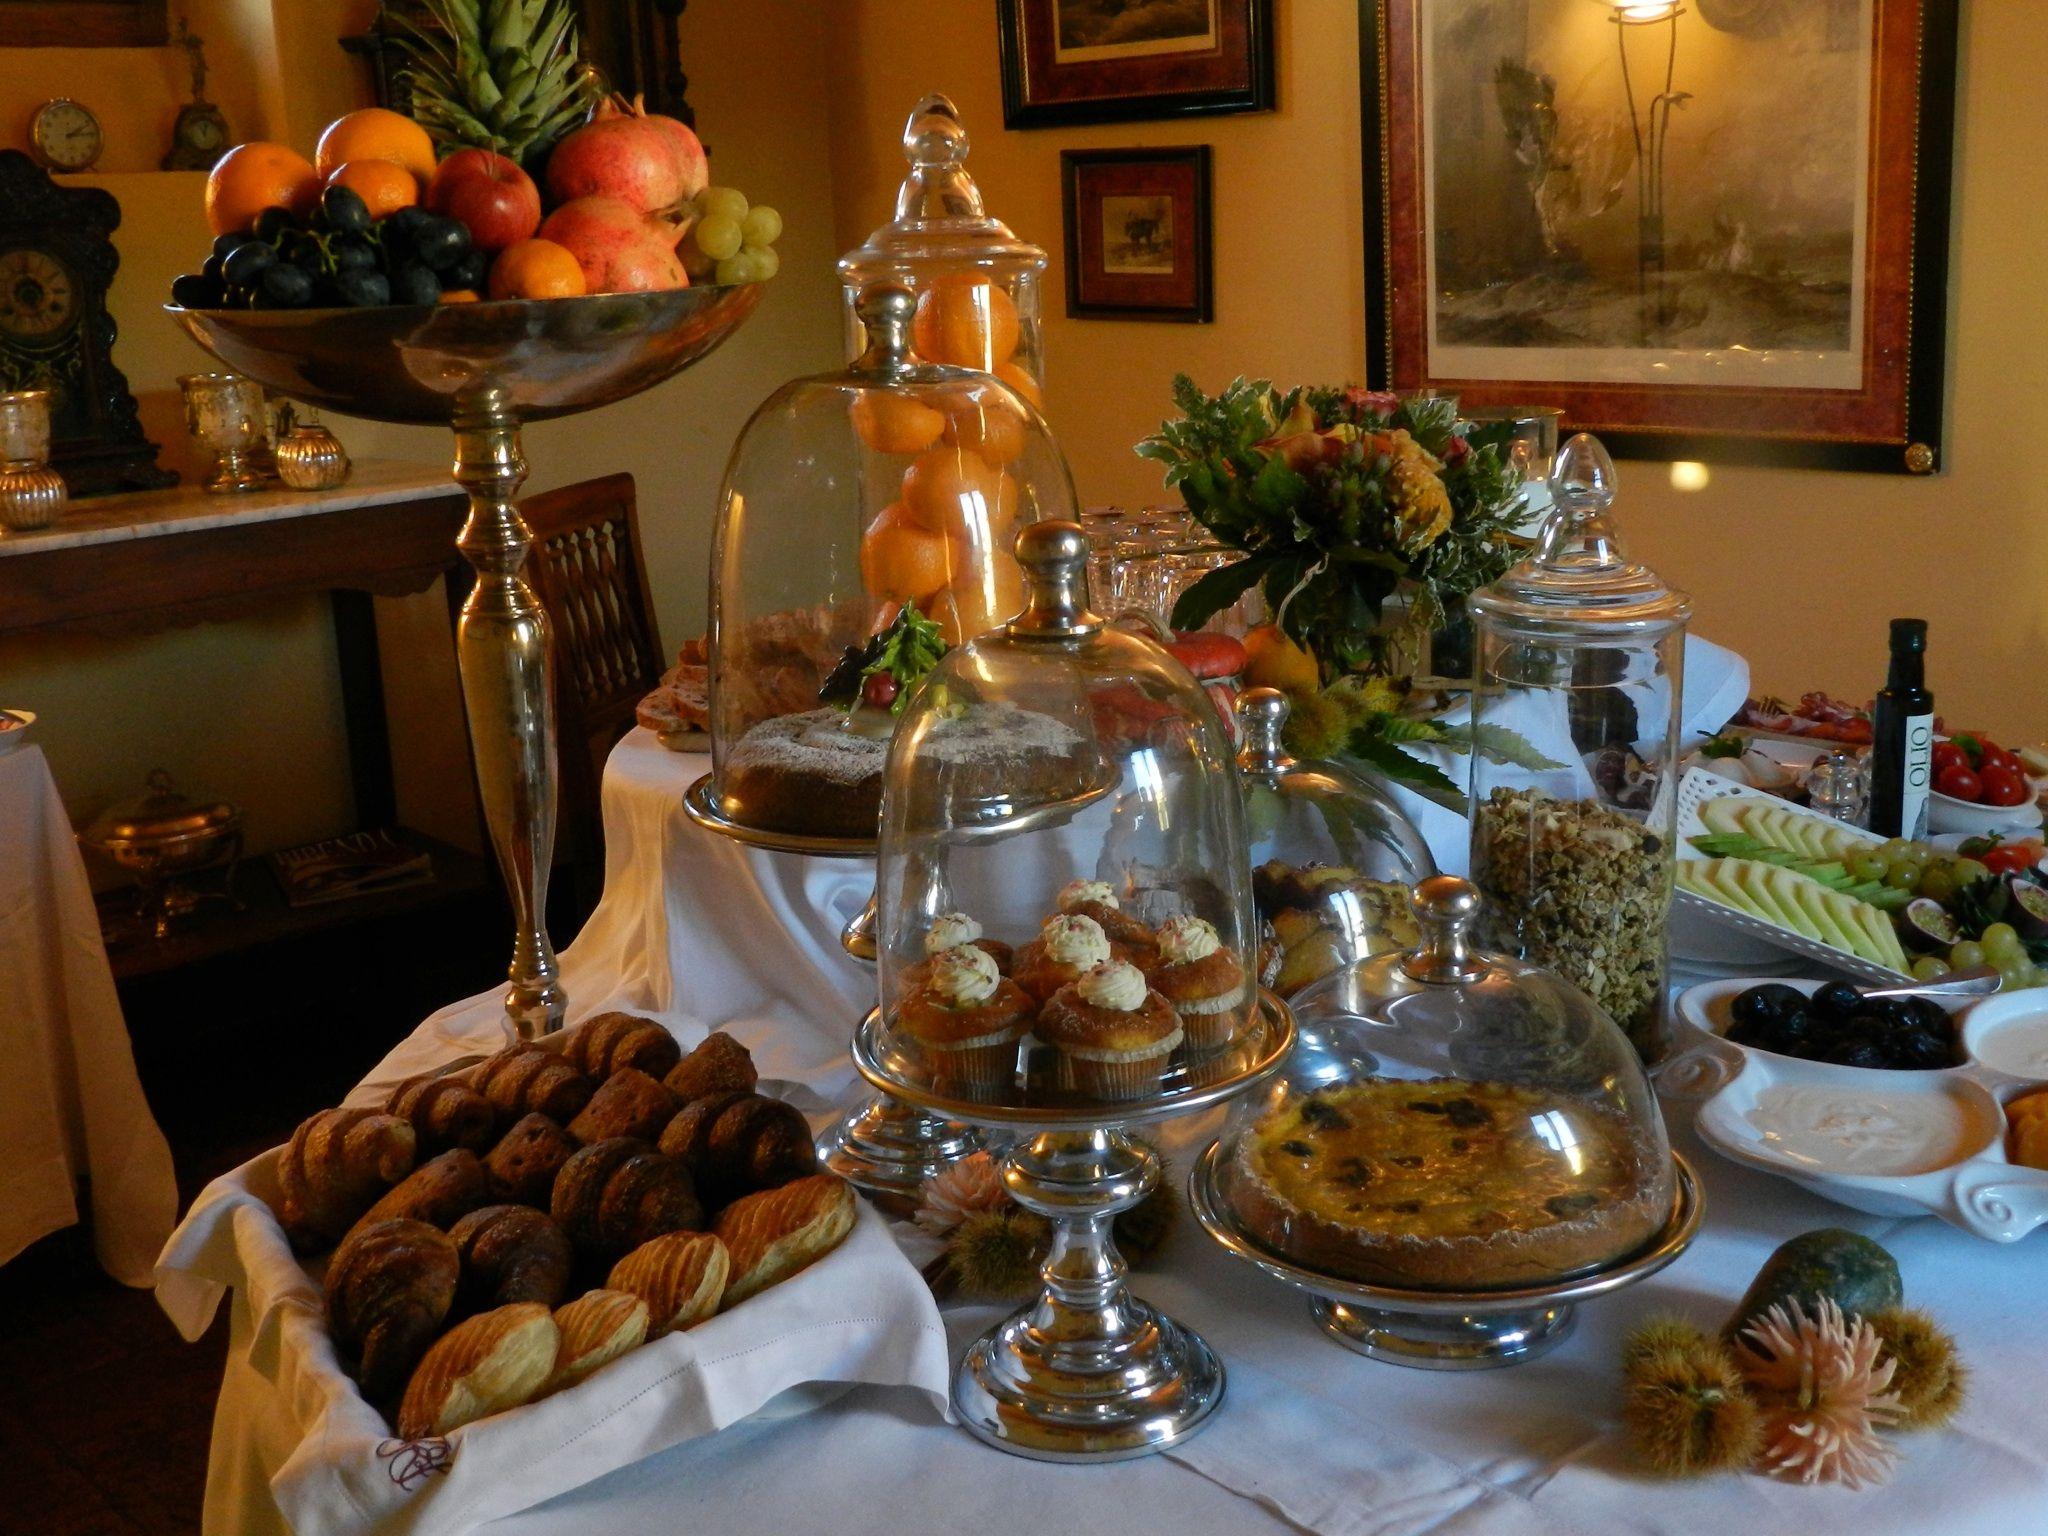 Buffet Breakfast A Sweet Awake Up Tuscany Hotel Vacation Countryside